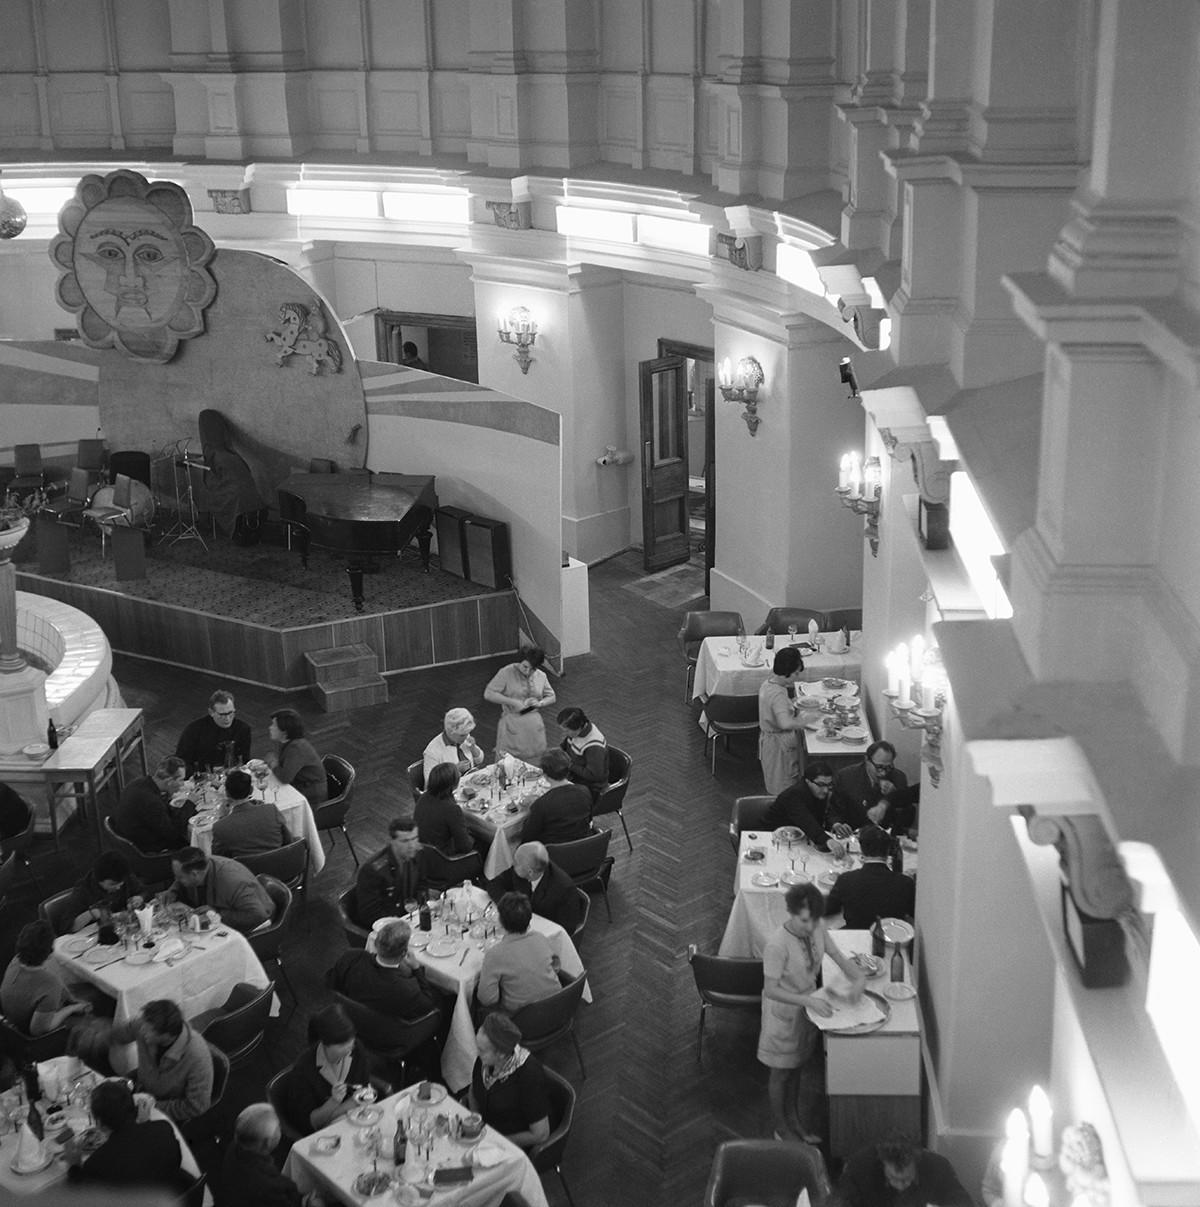 Slavyansky Bazar restaurant in Moscow, 1968.